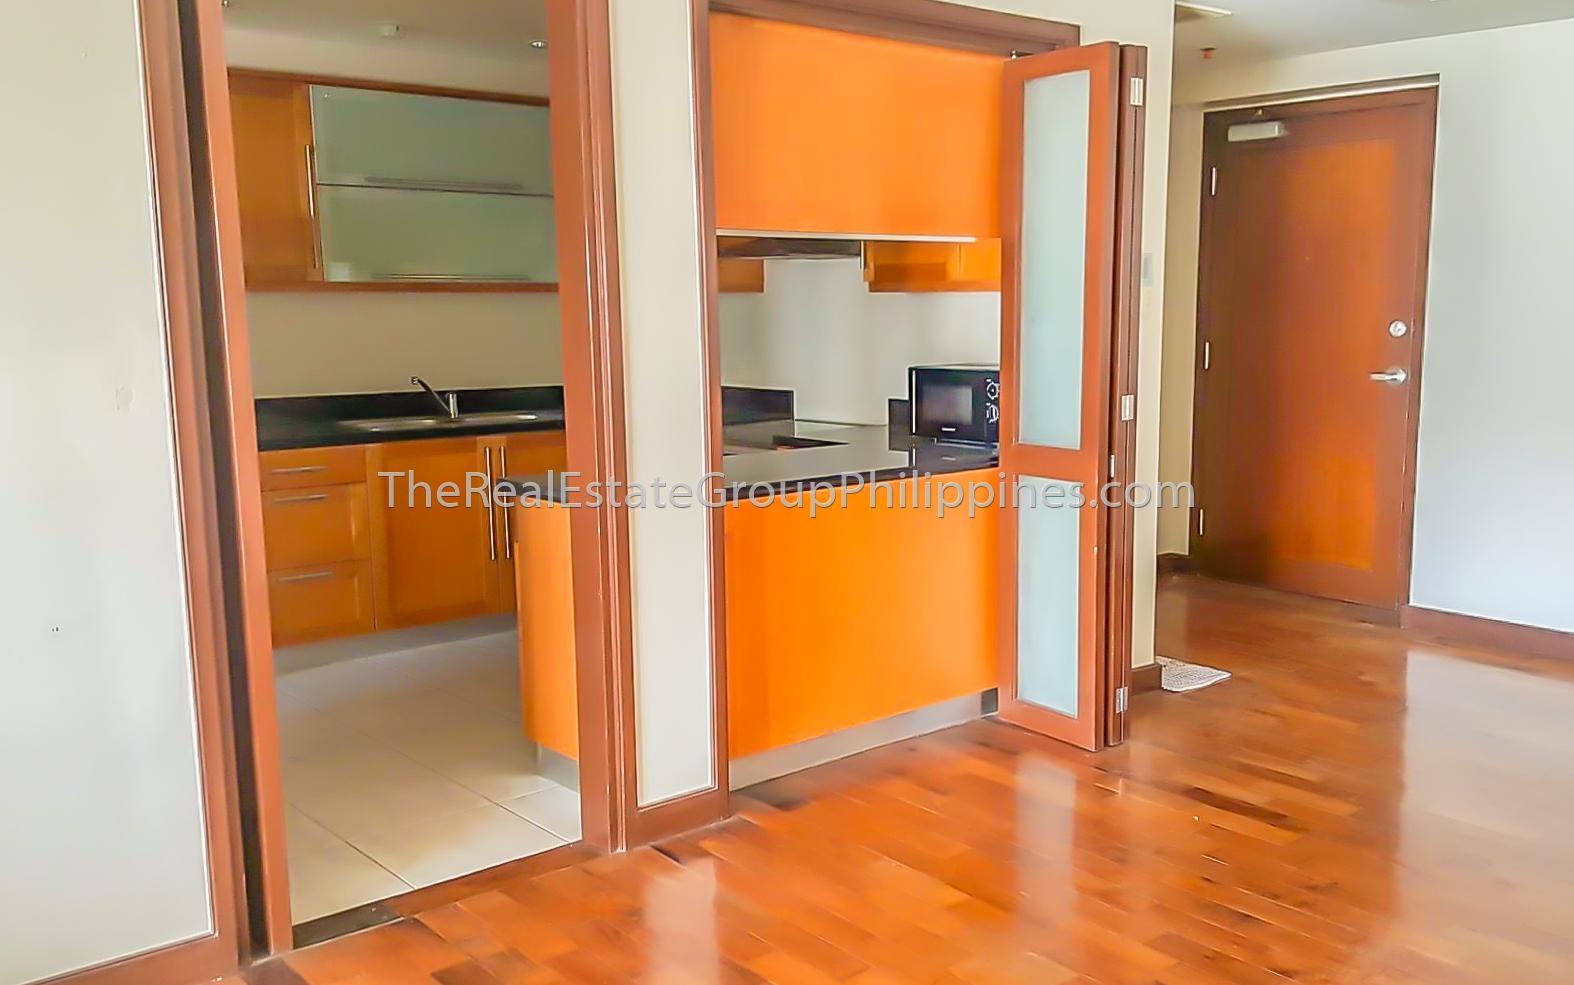 2BR Condo For Rent TRAG Laguna Tower Makati-150k (4 of 9)